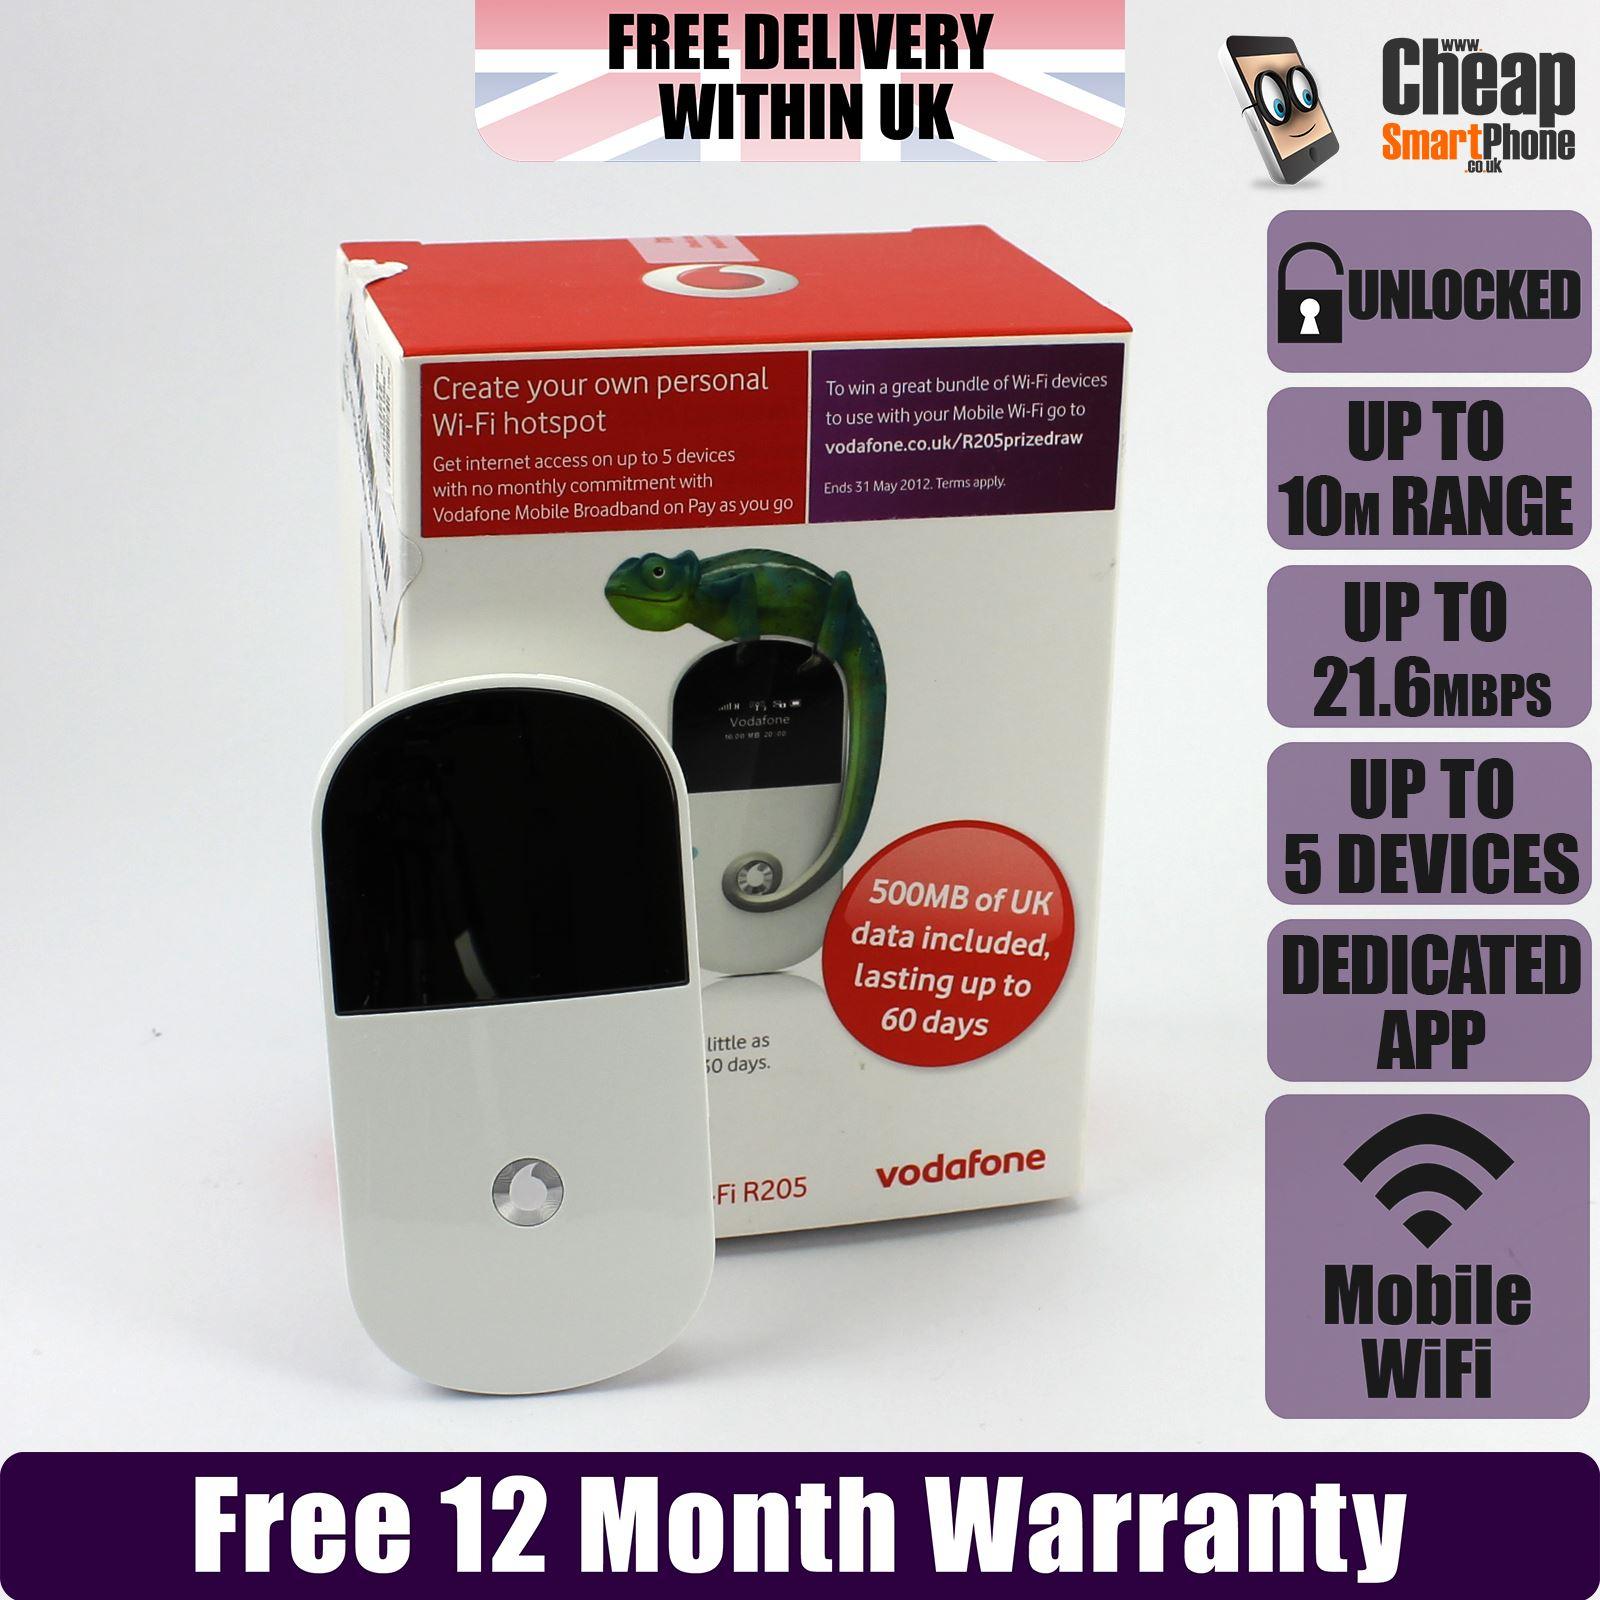 huawei e586 r205 mobile broadband wifi pocket modem mifi. Black Bedroom Furniture Sets. Home Design Ideas